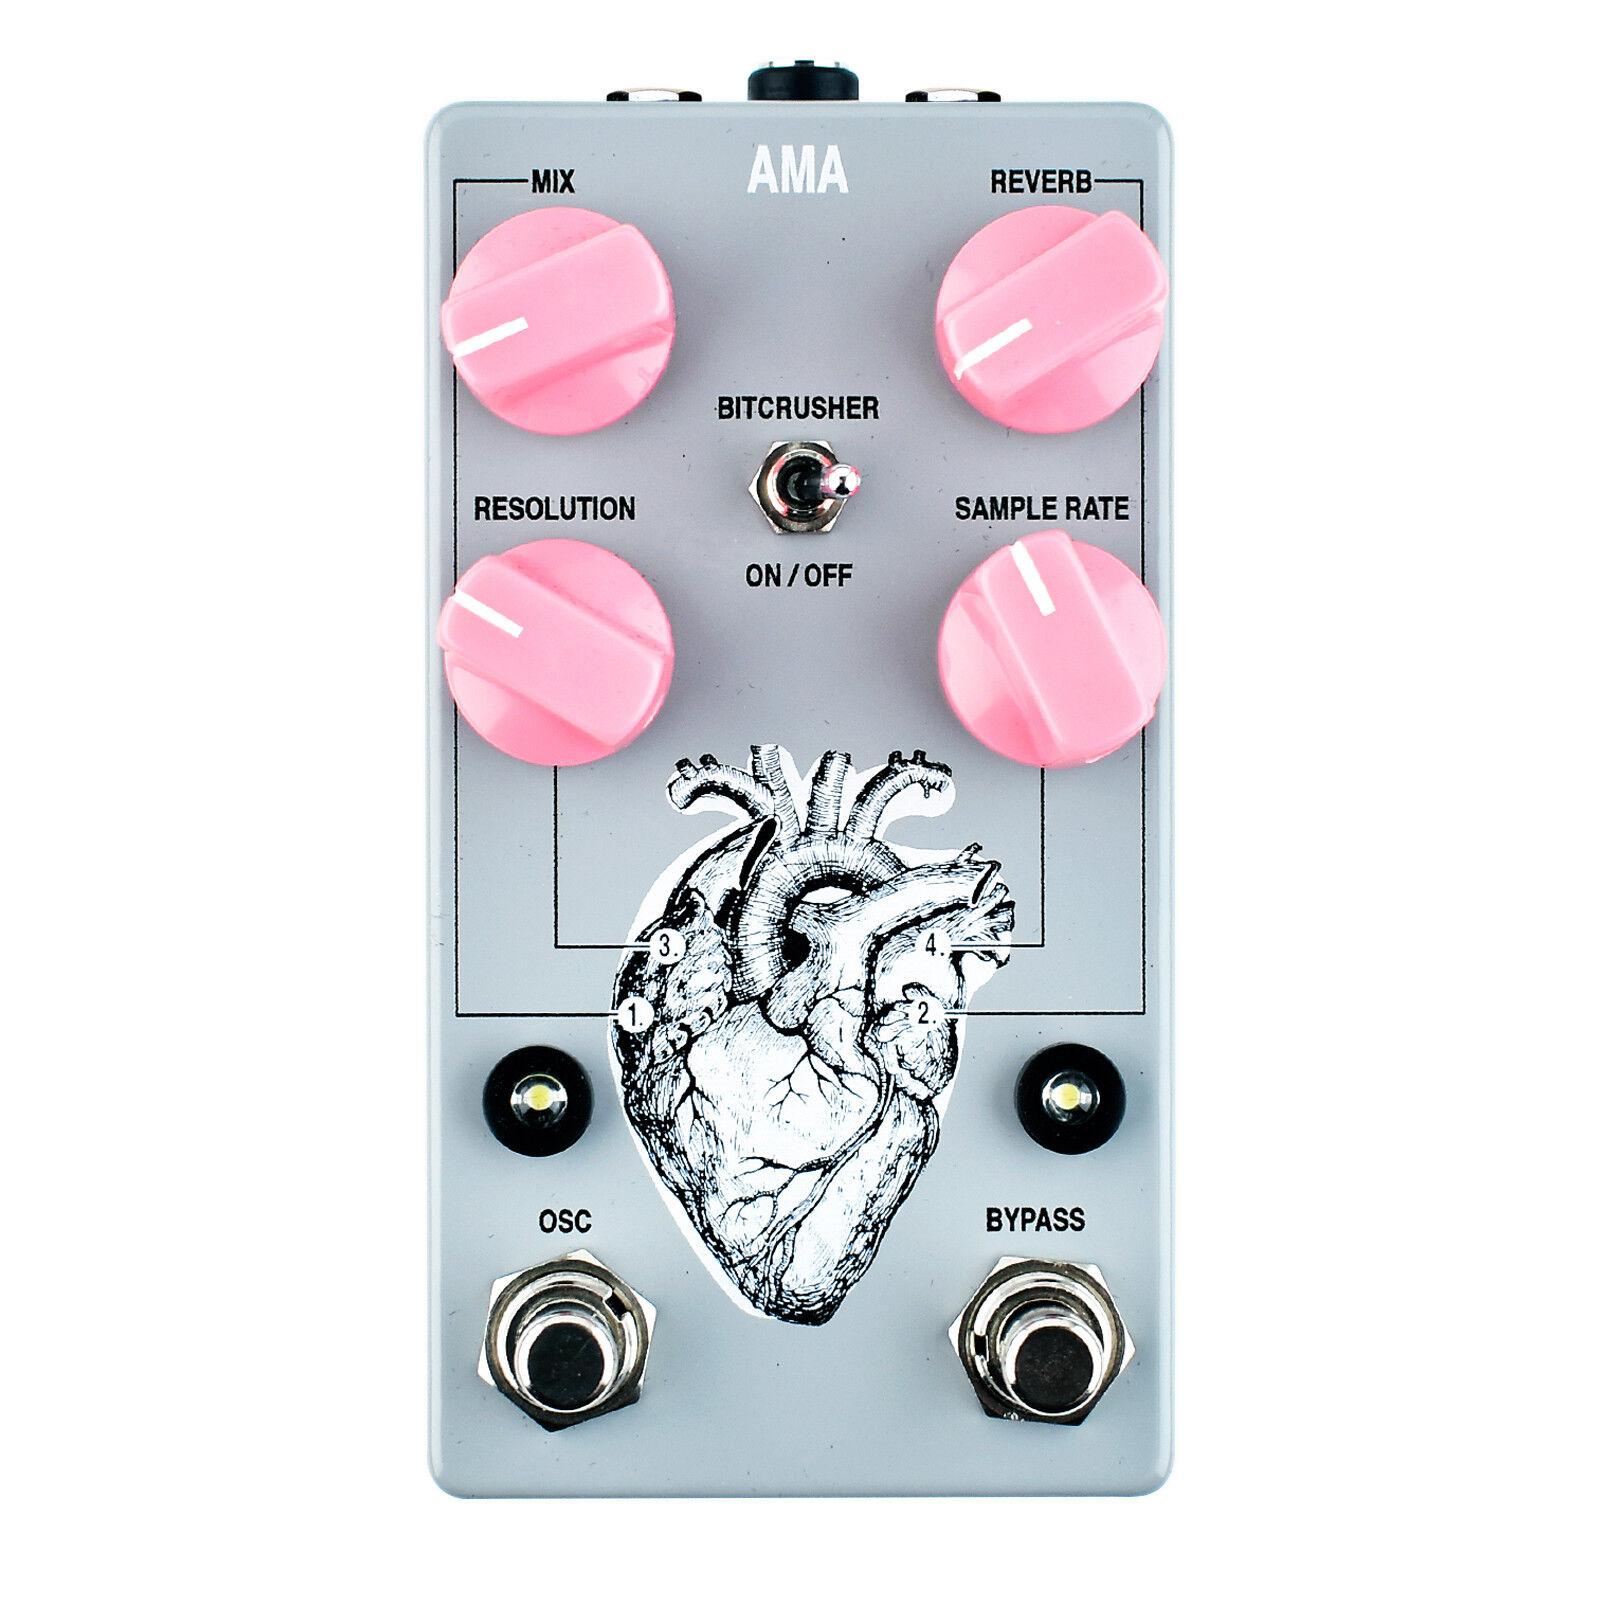 AC Noises AMA Reverb, Oscillator & Bit Crusher Pedal